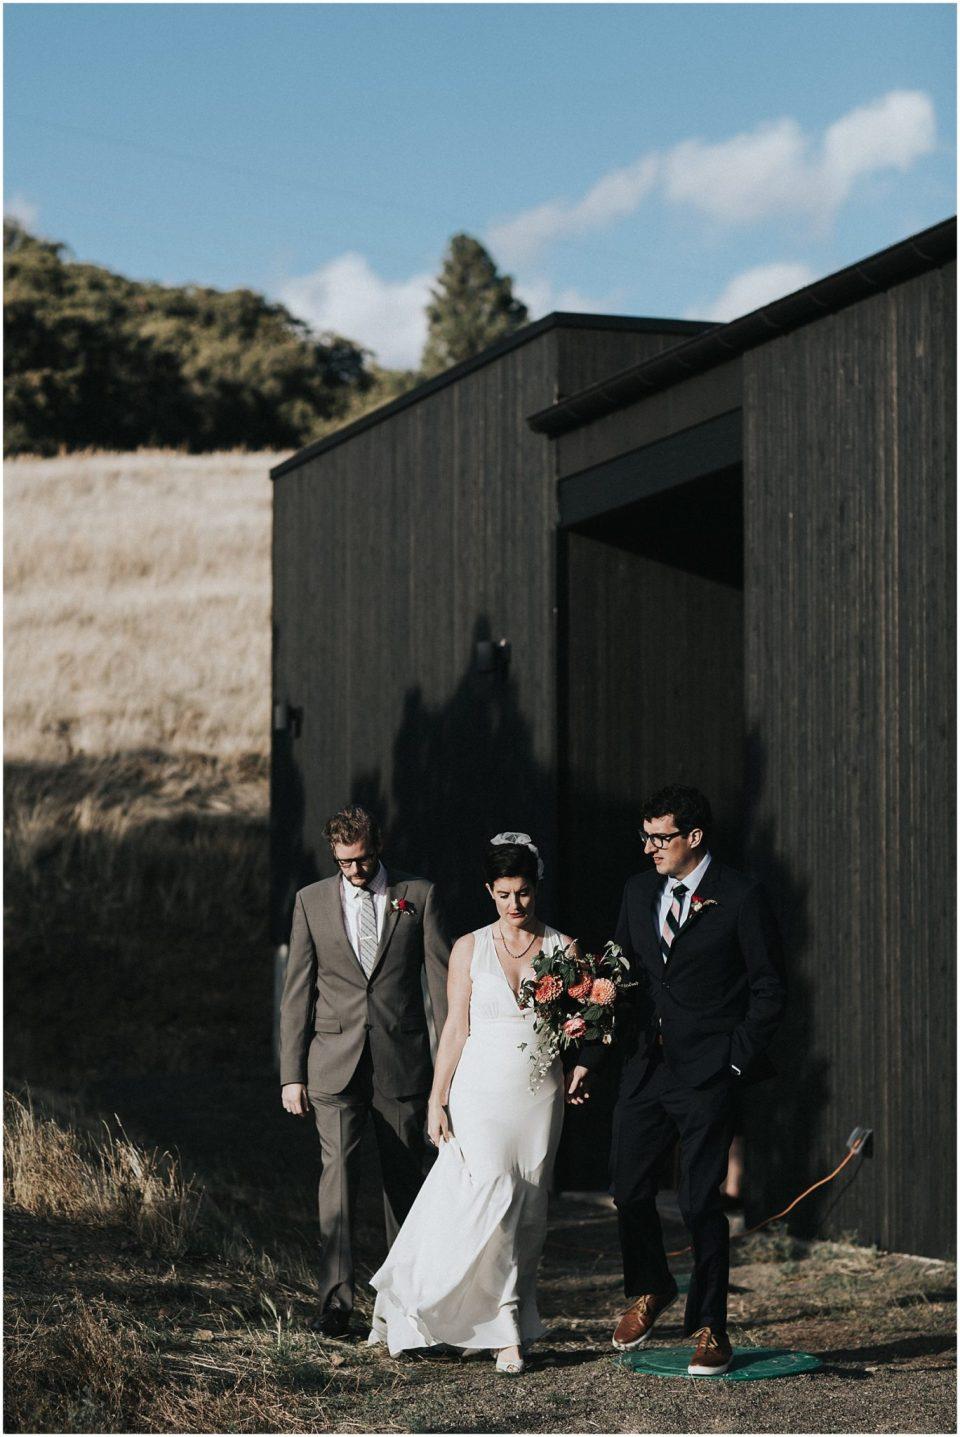 benjamin-colleen-corcellars-wedding (36 of 74)_seattle wedding.jpg